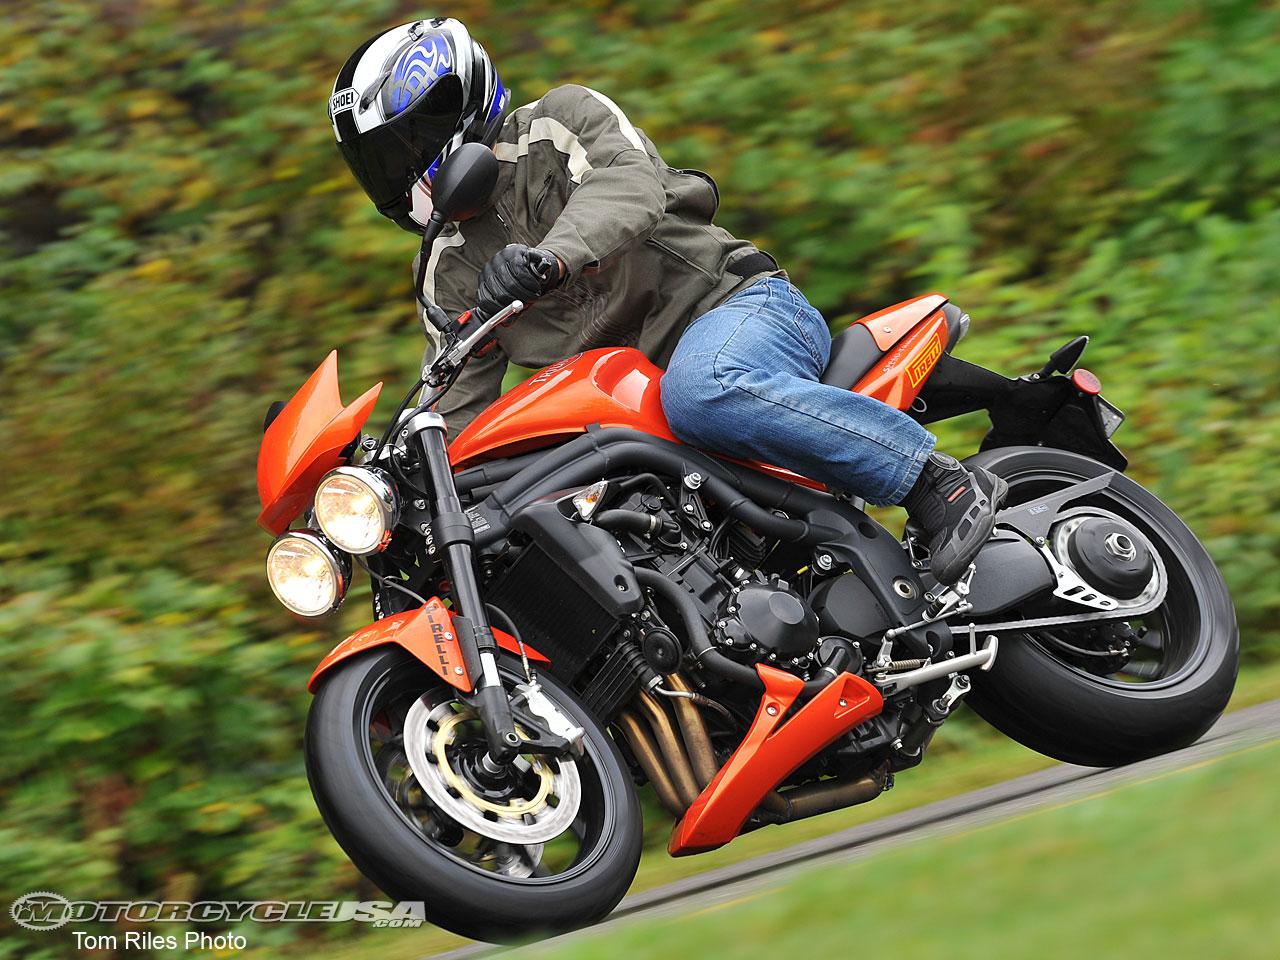 http://4.bp.blogspot.com/-irTff8EYZoA/TwCvuHrqAQI/AAAAAAAAA6w/YHkNQPWPG-8/s1600/Pirelli-Angel-ST-Tire-6.jpg